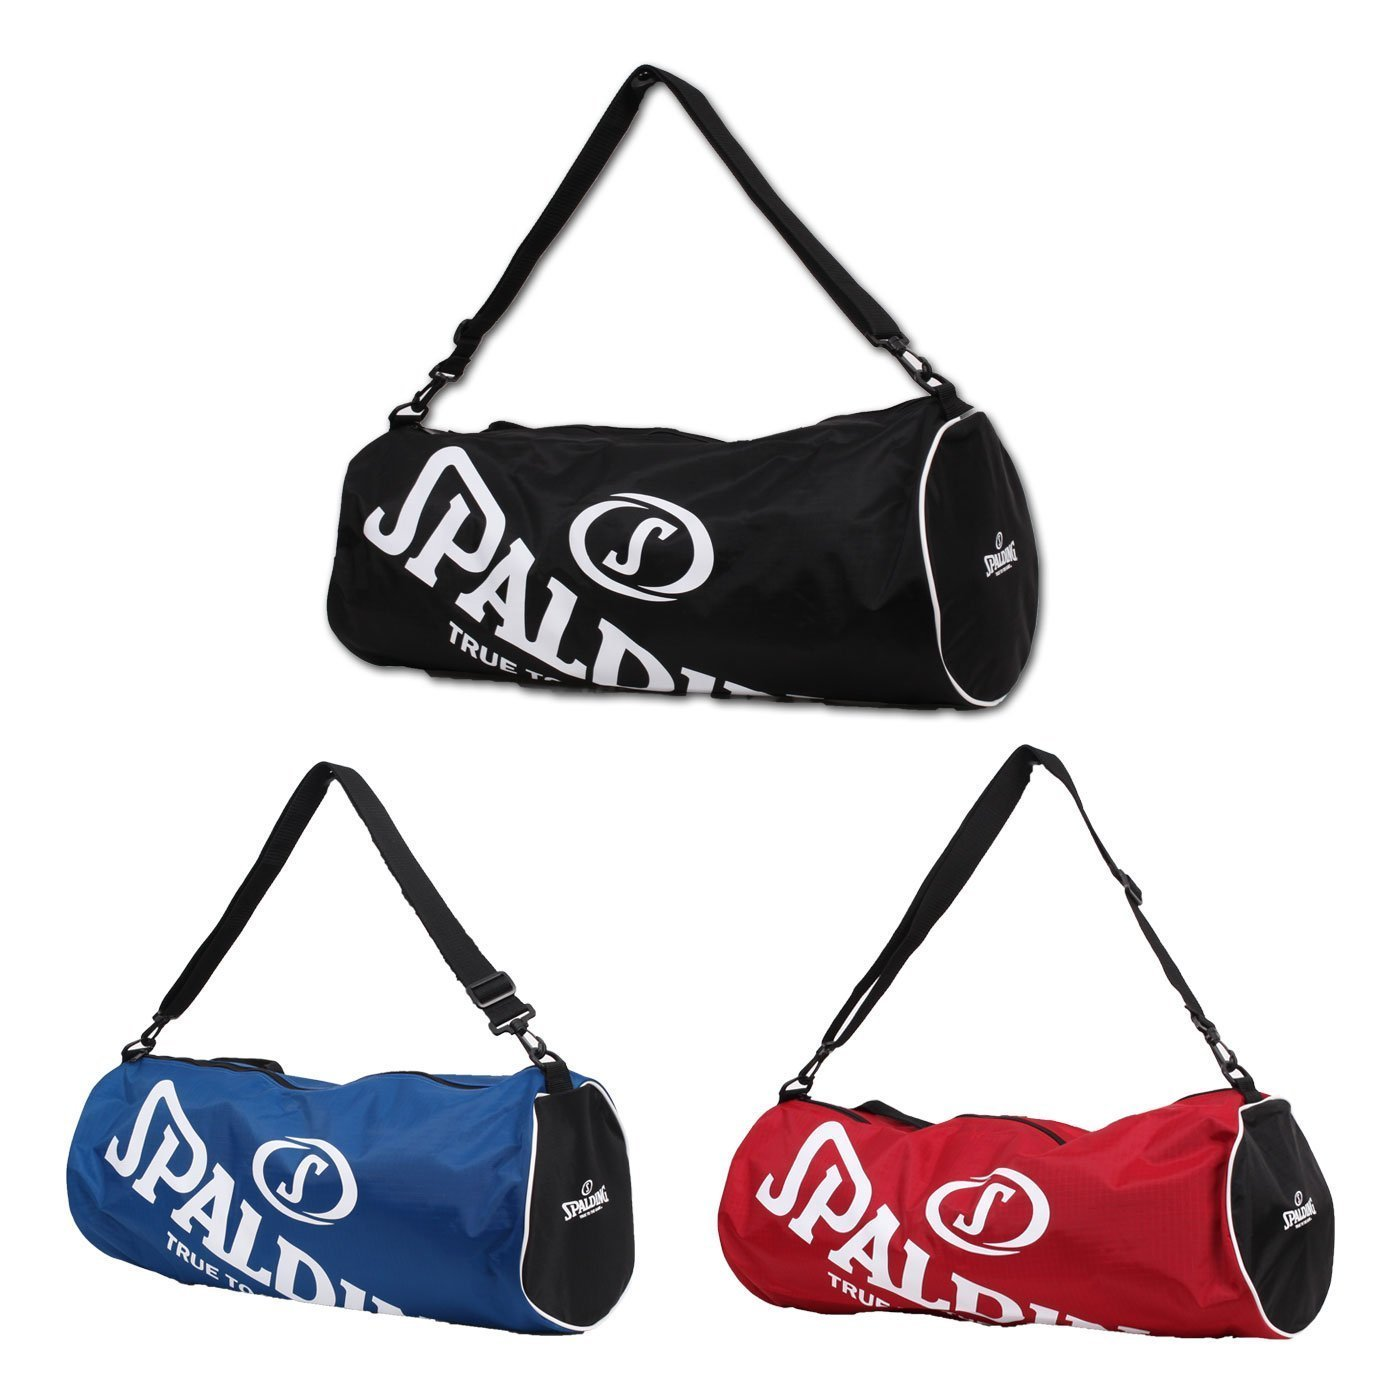 SPALDING 三顆裝籃球袋(斯伯丁 側背包 手提袋 收納袋 行李袋 NBA 【05481008】≡排汗專家≡